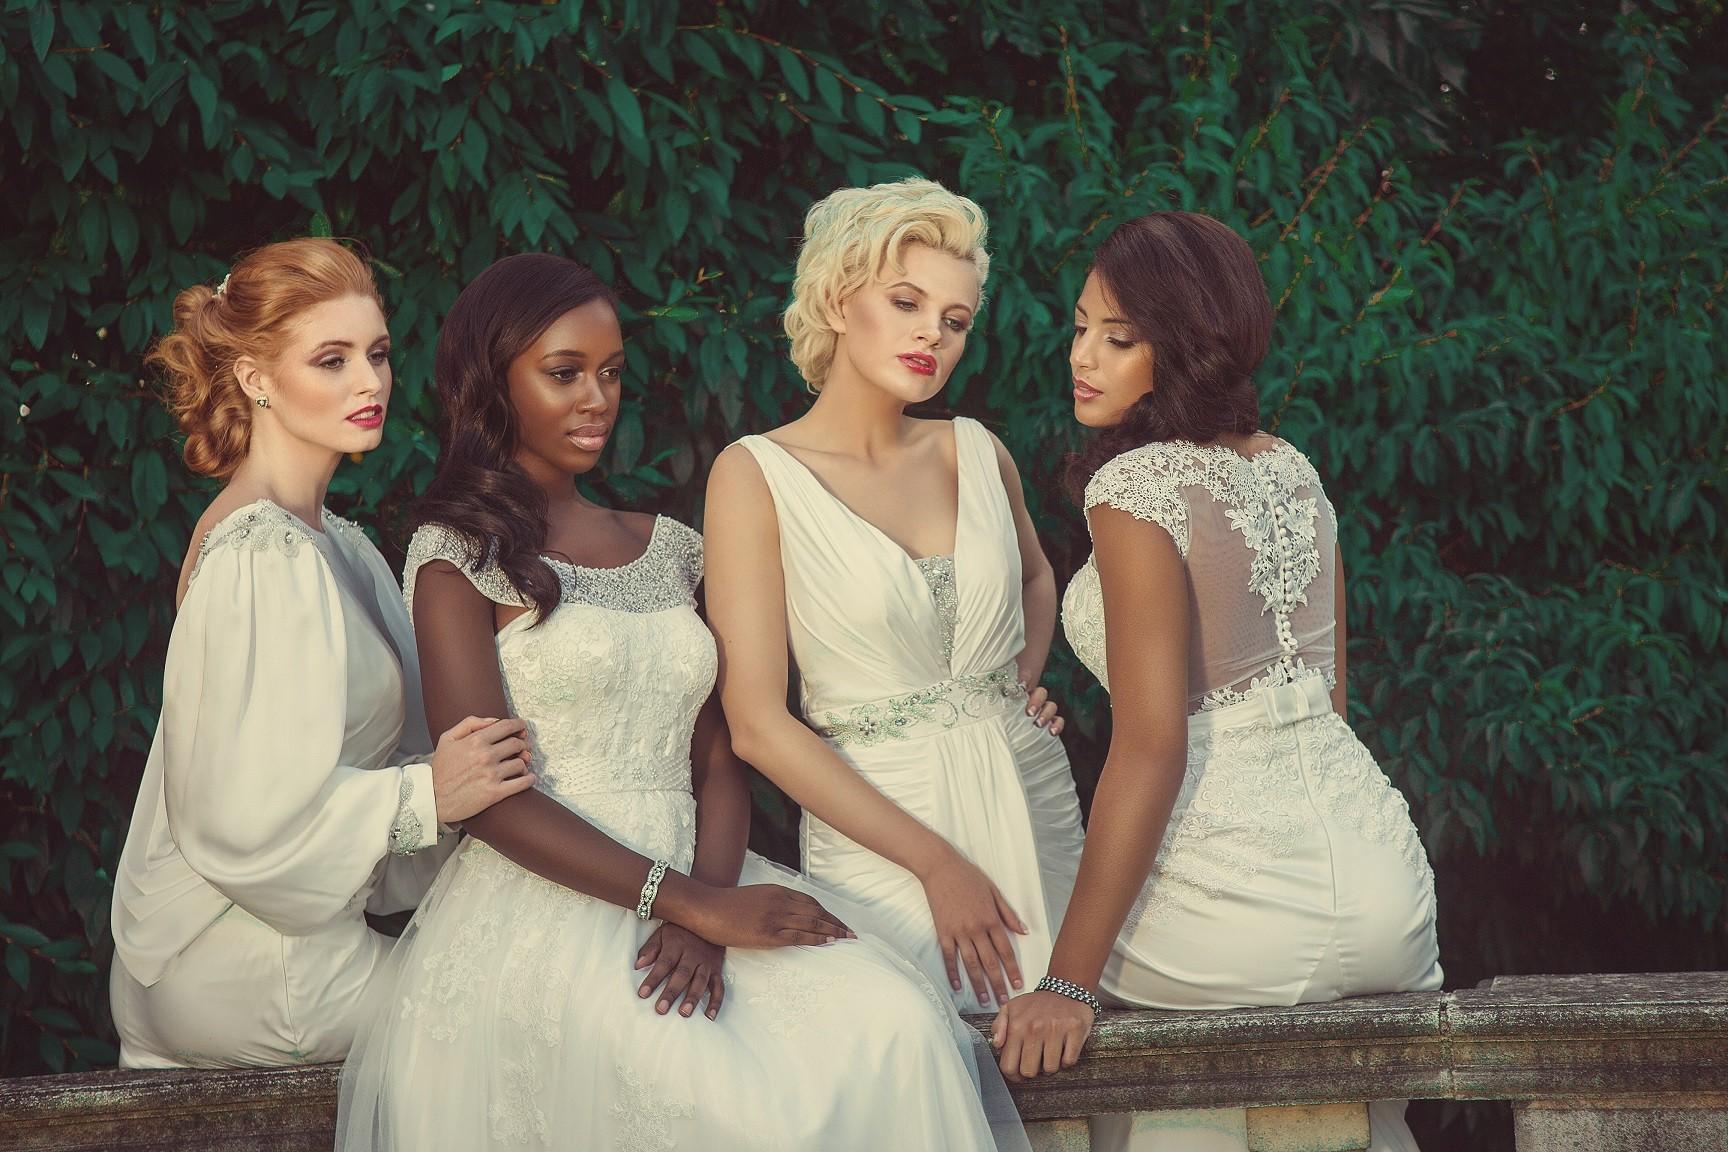 Estilo moda bridal affordable luxury designer wedding dresses estilo moda bridal affordable luxury designer wedding dresses milton keynes london stunning lace satin designs ombrellifo Images